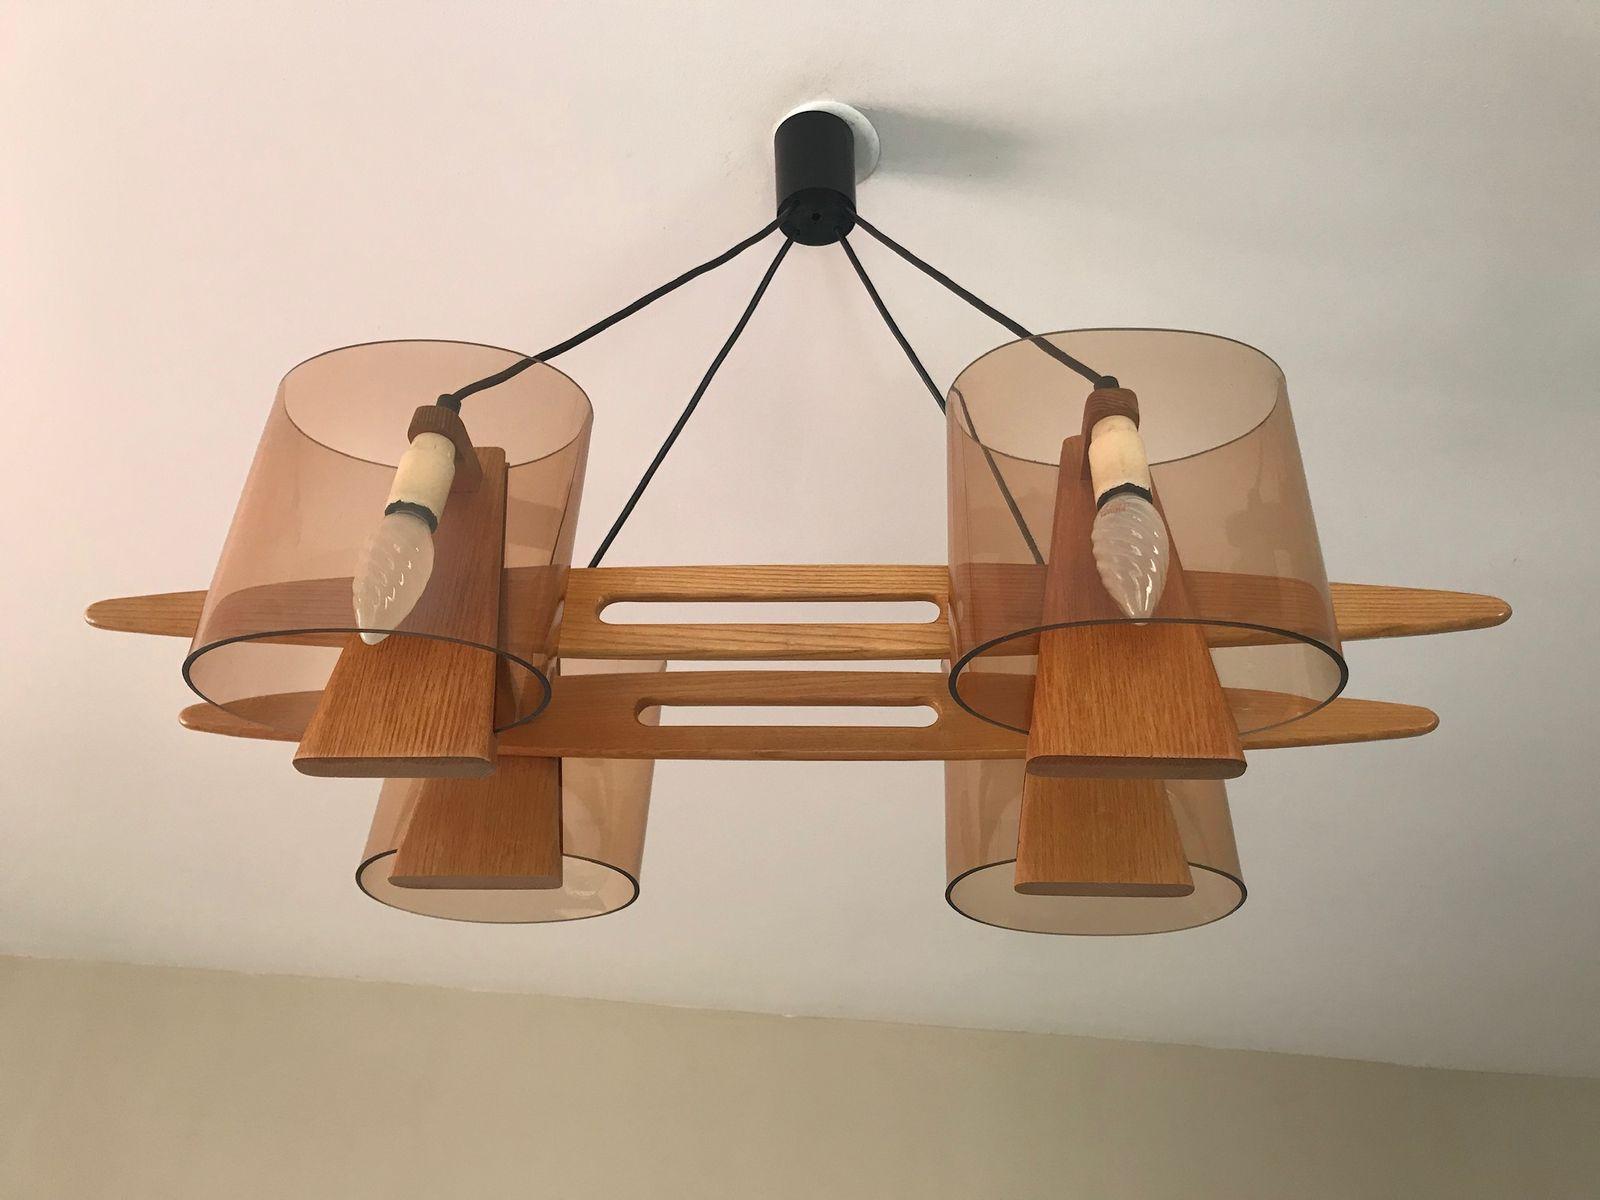 Kronleuchter Holz ~ Kronleuchter aus holz 1960er bei pamono kaufen